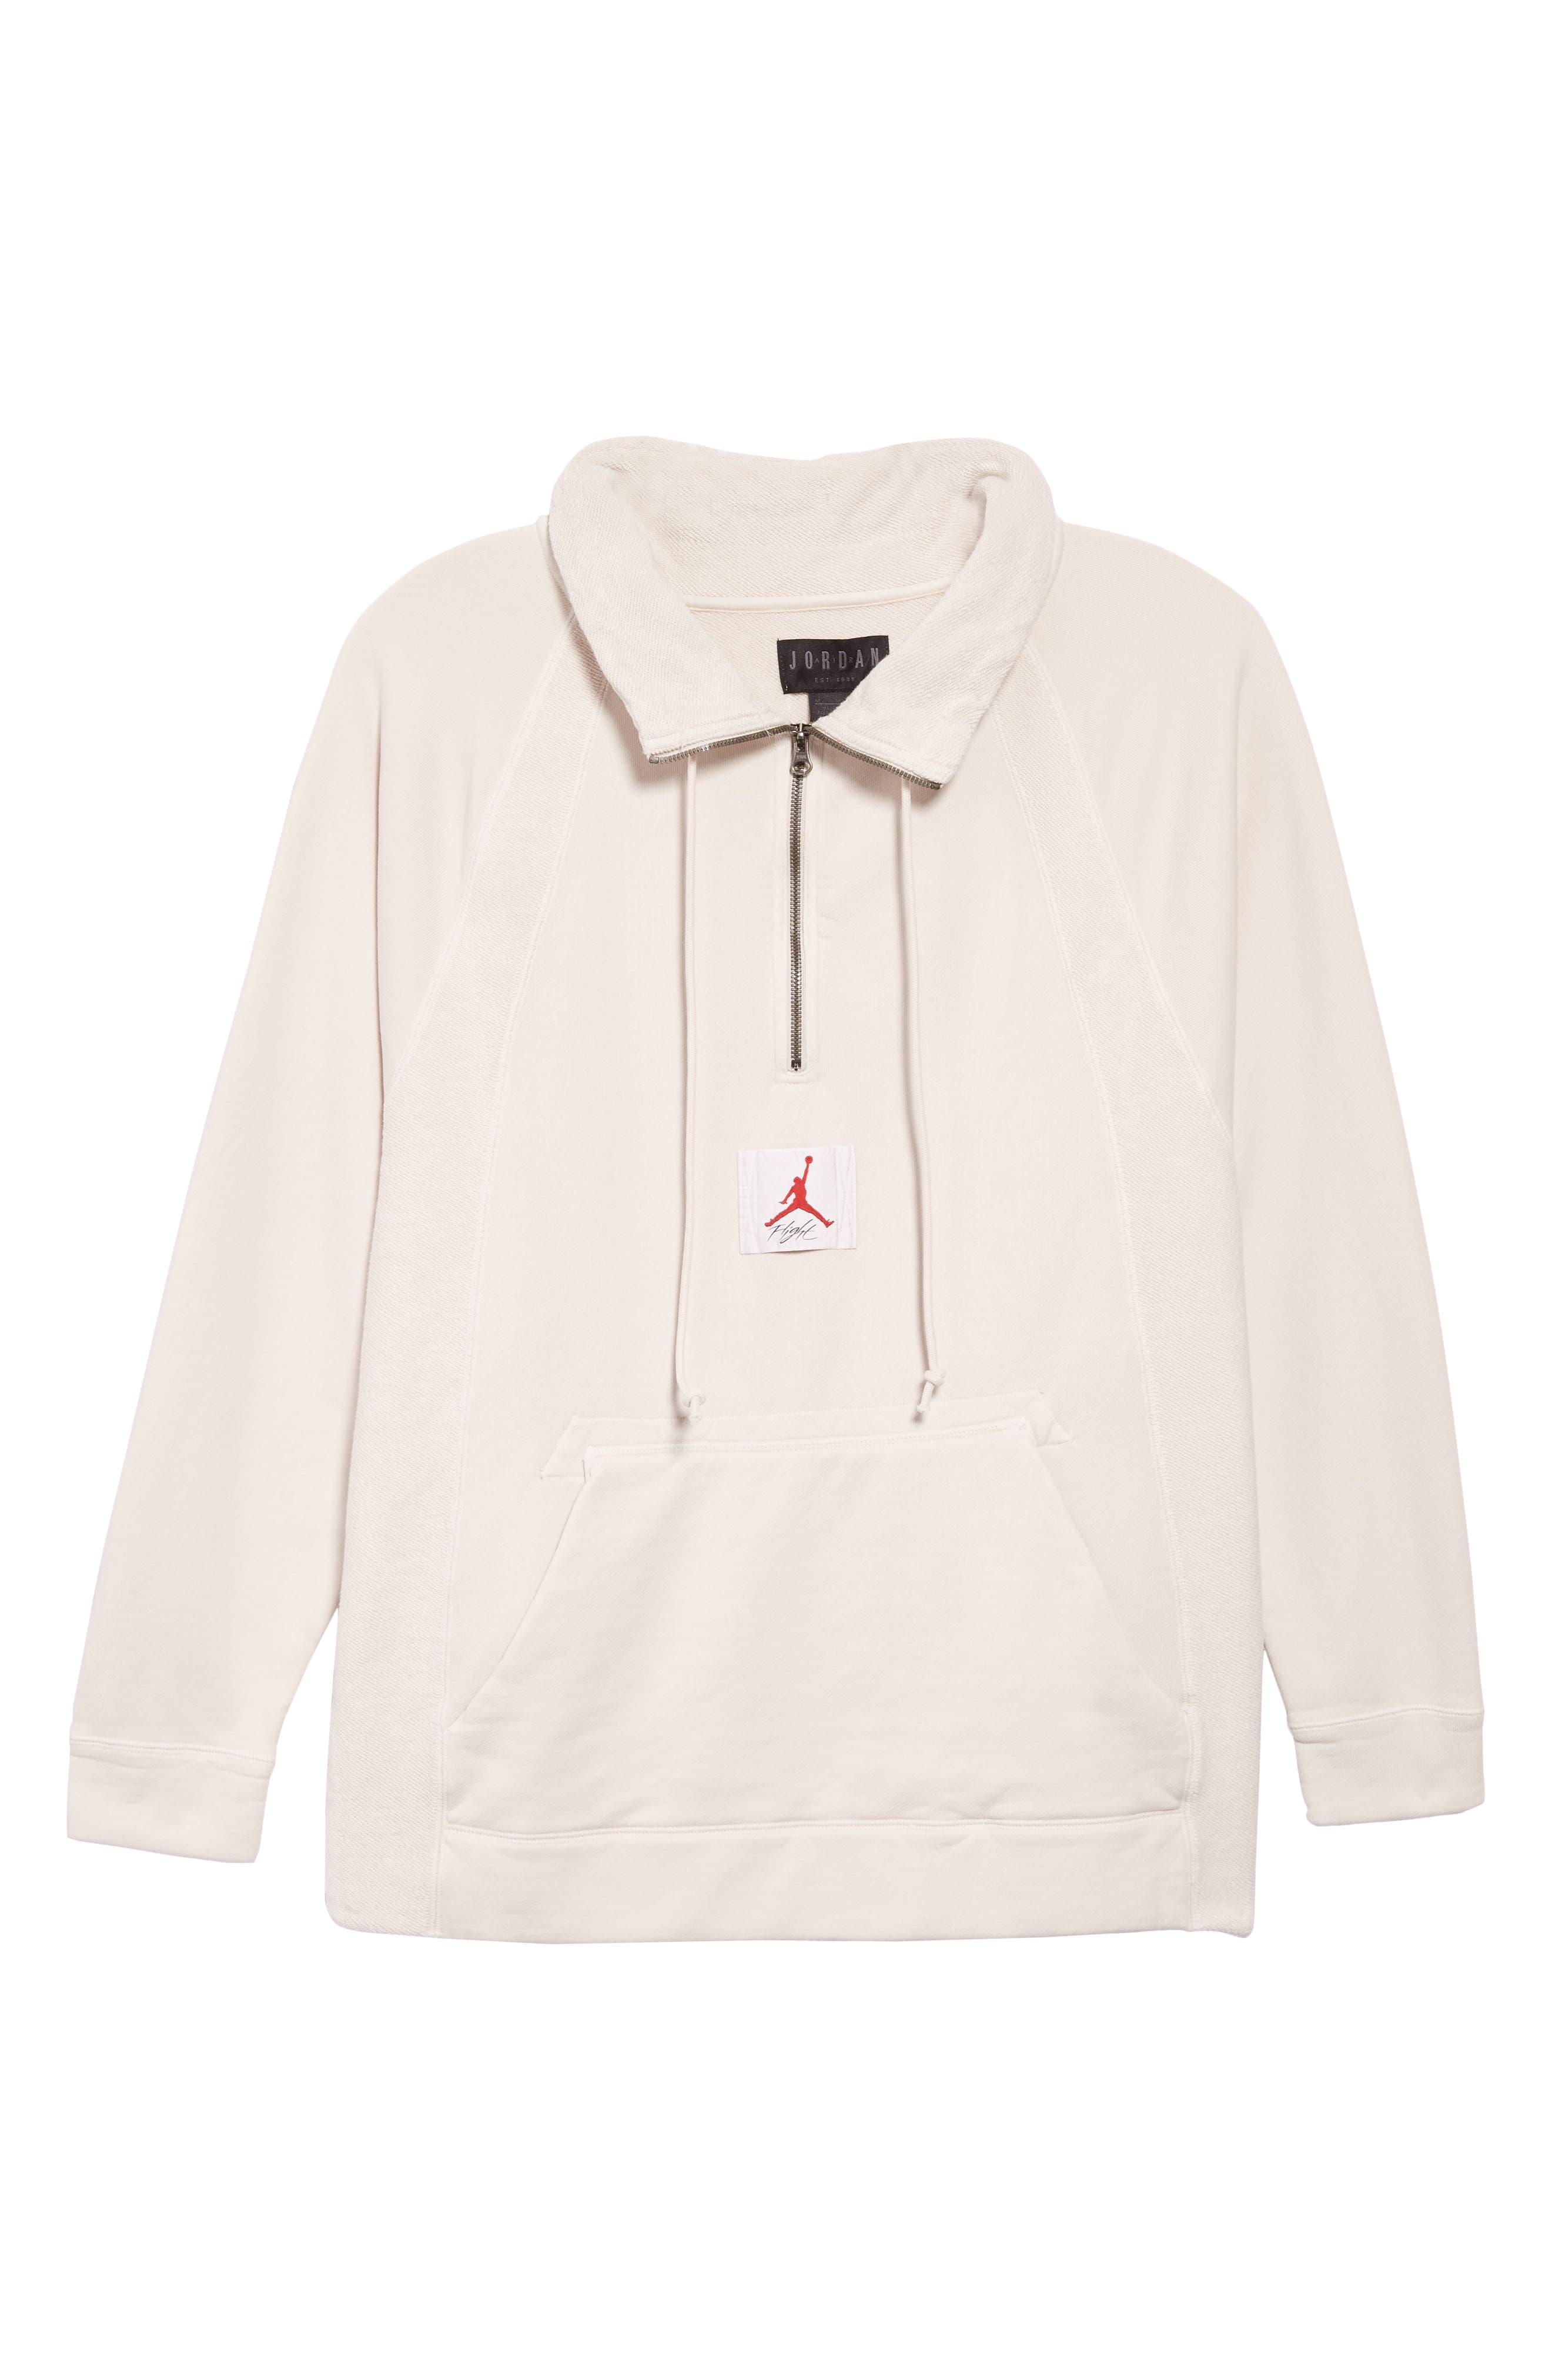 Jordan Wings Washed Quarter Zip Sweatshirt,                             Alternate thumbnail 6, color,                             LIGHT BONE